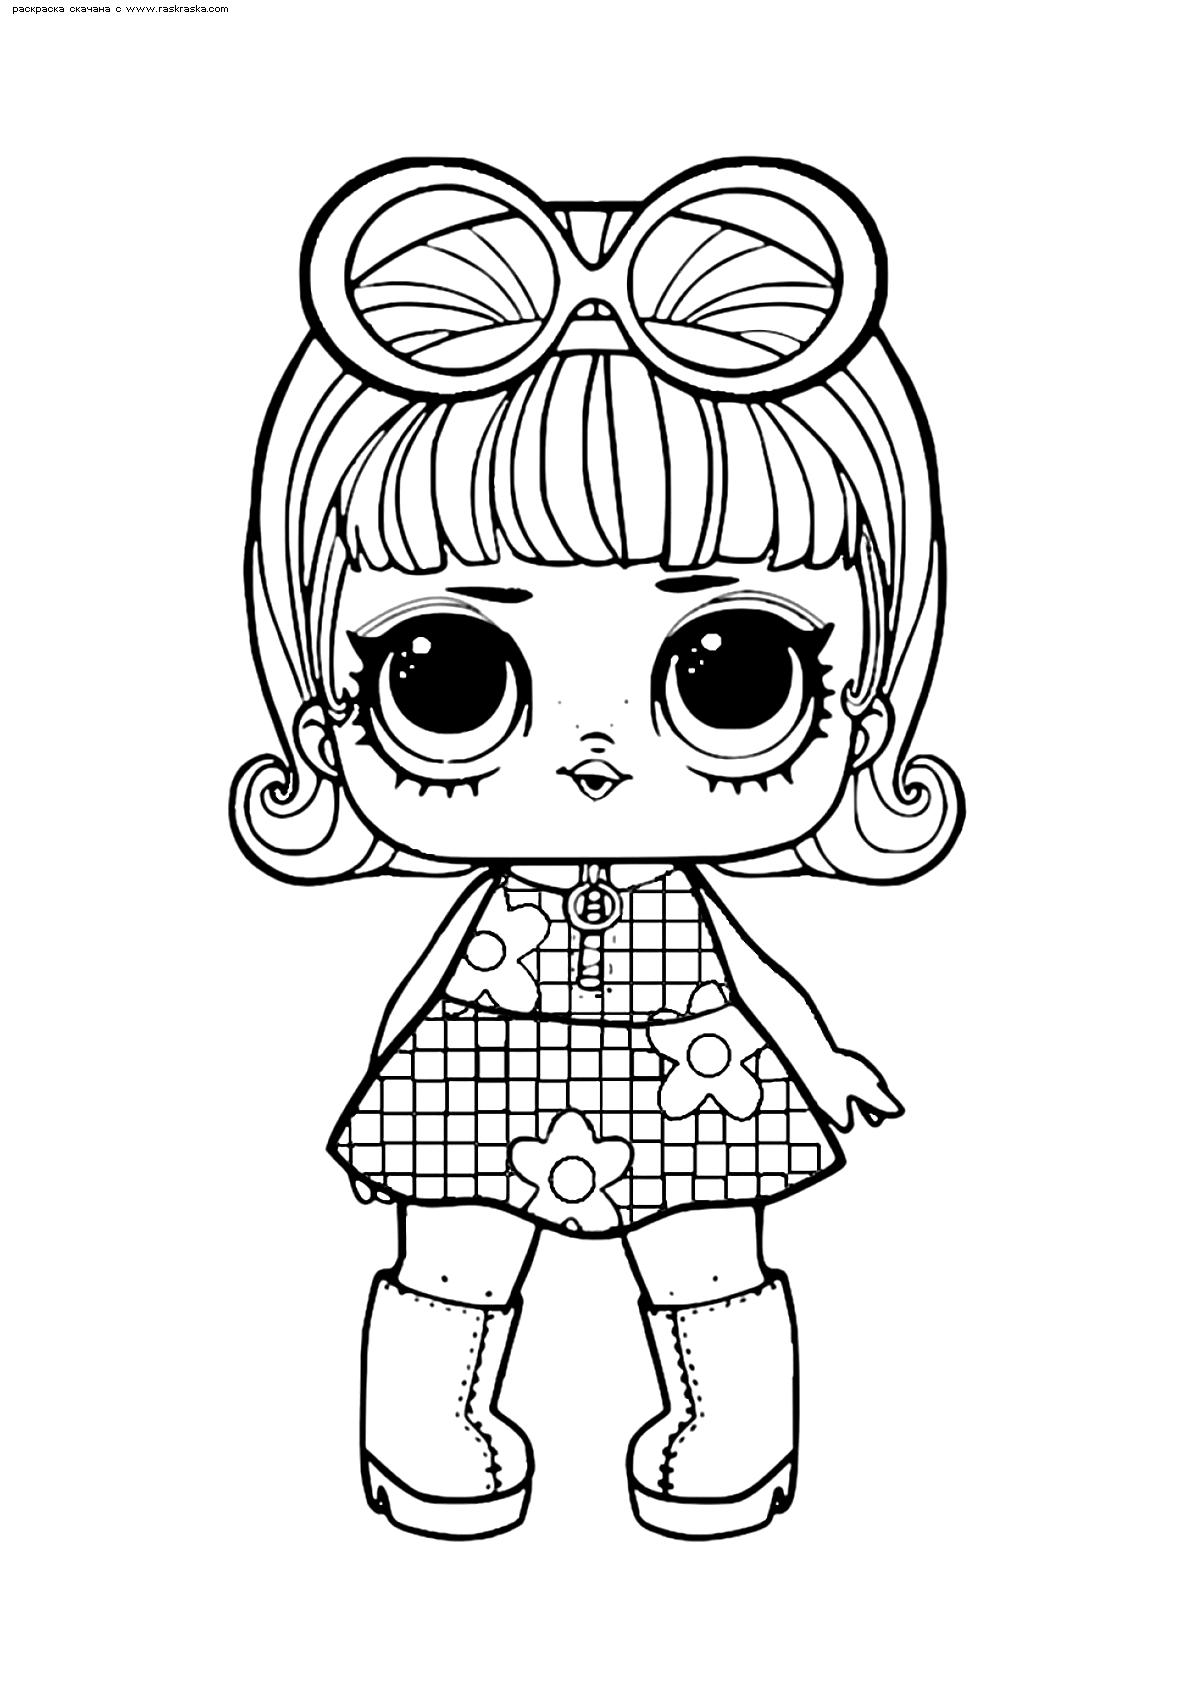 Раскраска ЛОЛ конфетти поп Девочка Гоу-Гоу | Раскраски ЛОЛ ...